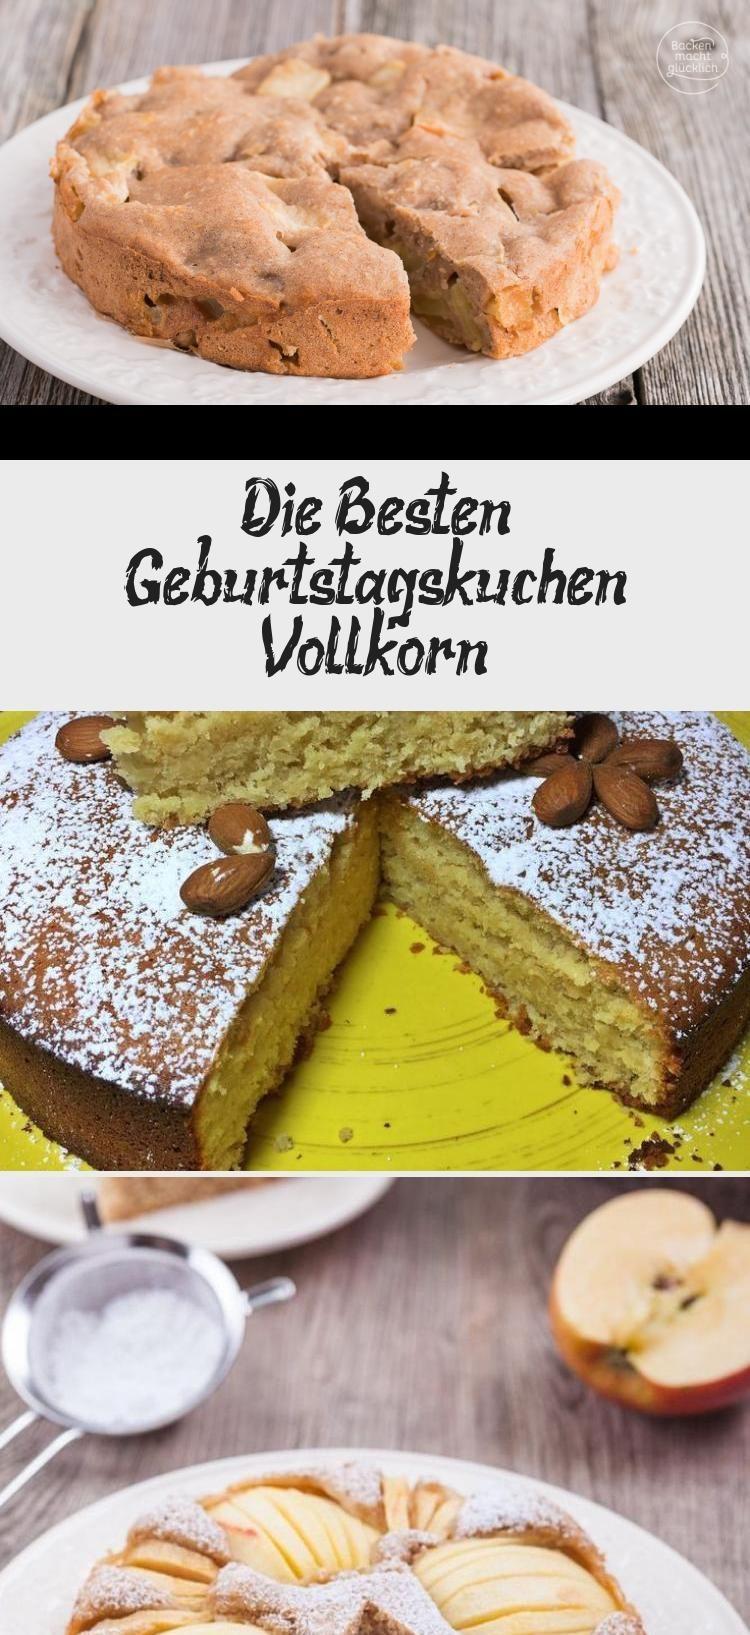 Photo of Gesunde Pinata-Geburtstagstorte. Die beste Vollkorn-Geburtstagstorte #PinataK …